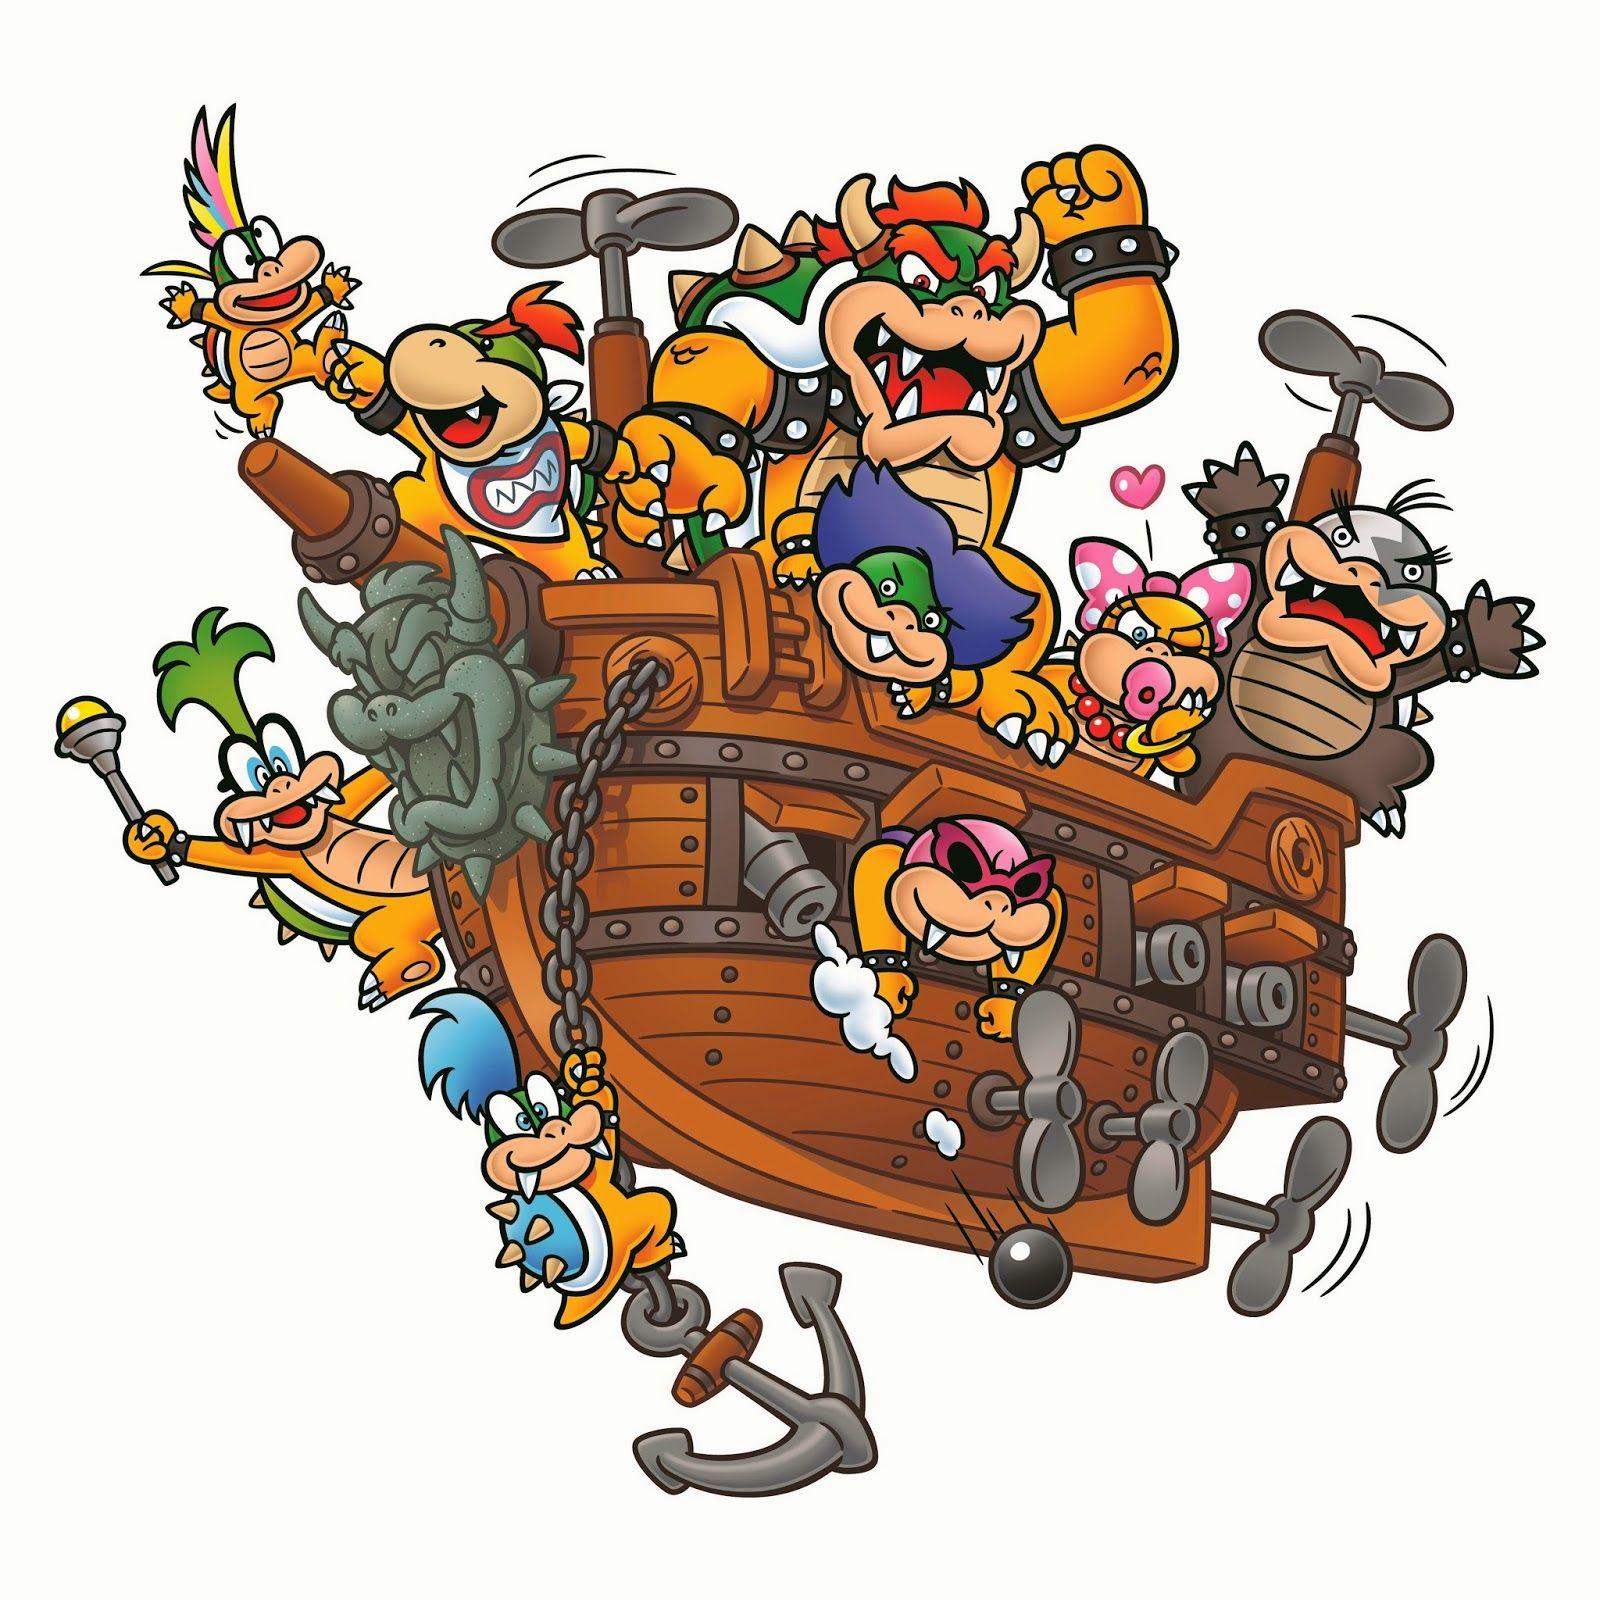 O Chan S Blog Of Protoculture Super Mario Bros Art Style Retrospective Part 3 The Mario Franchise Then And Now Mario Art Mario Super Mario